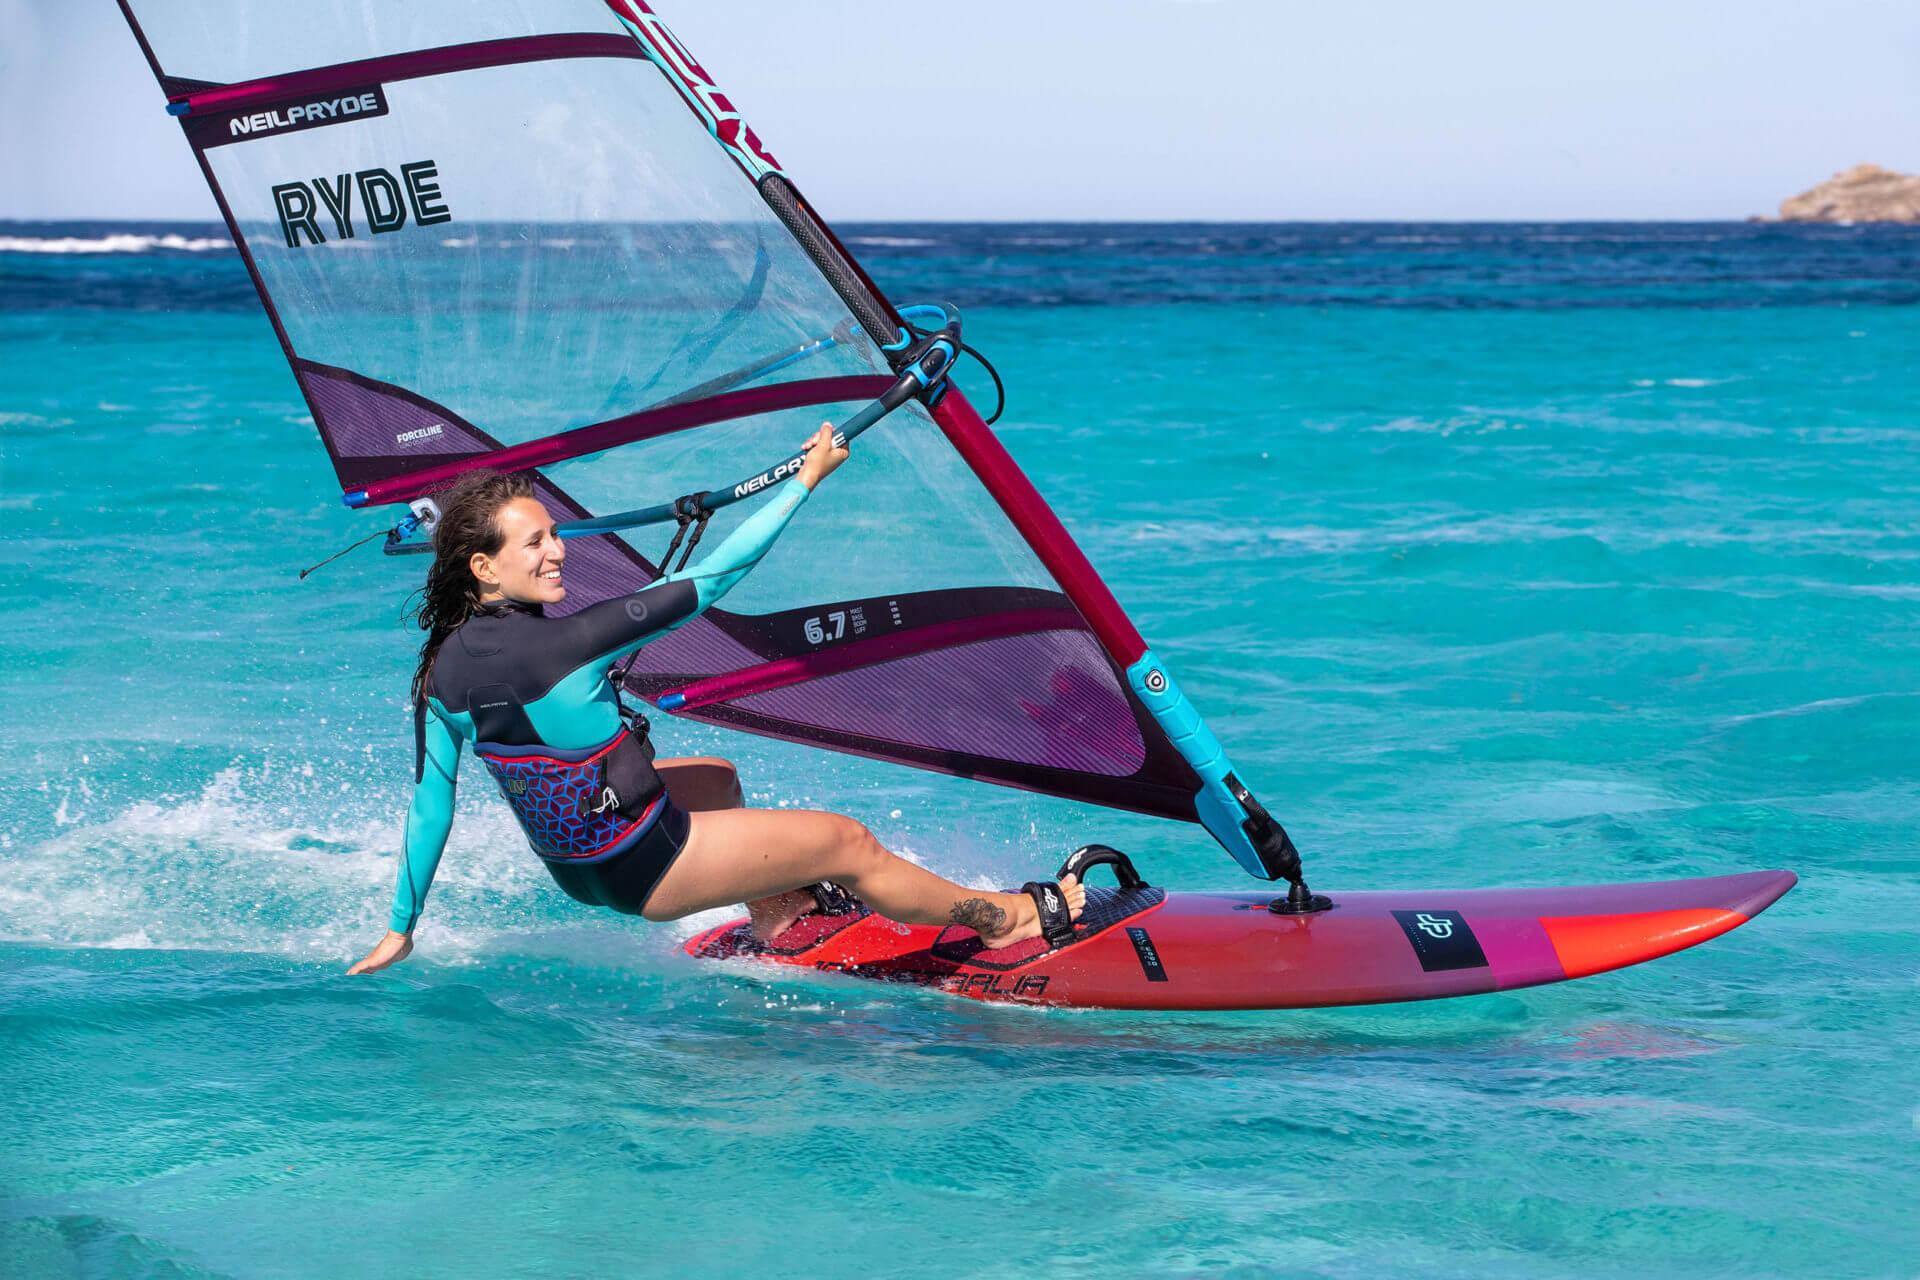 windsurfing-jp-australia